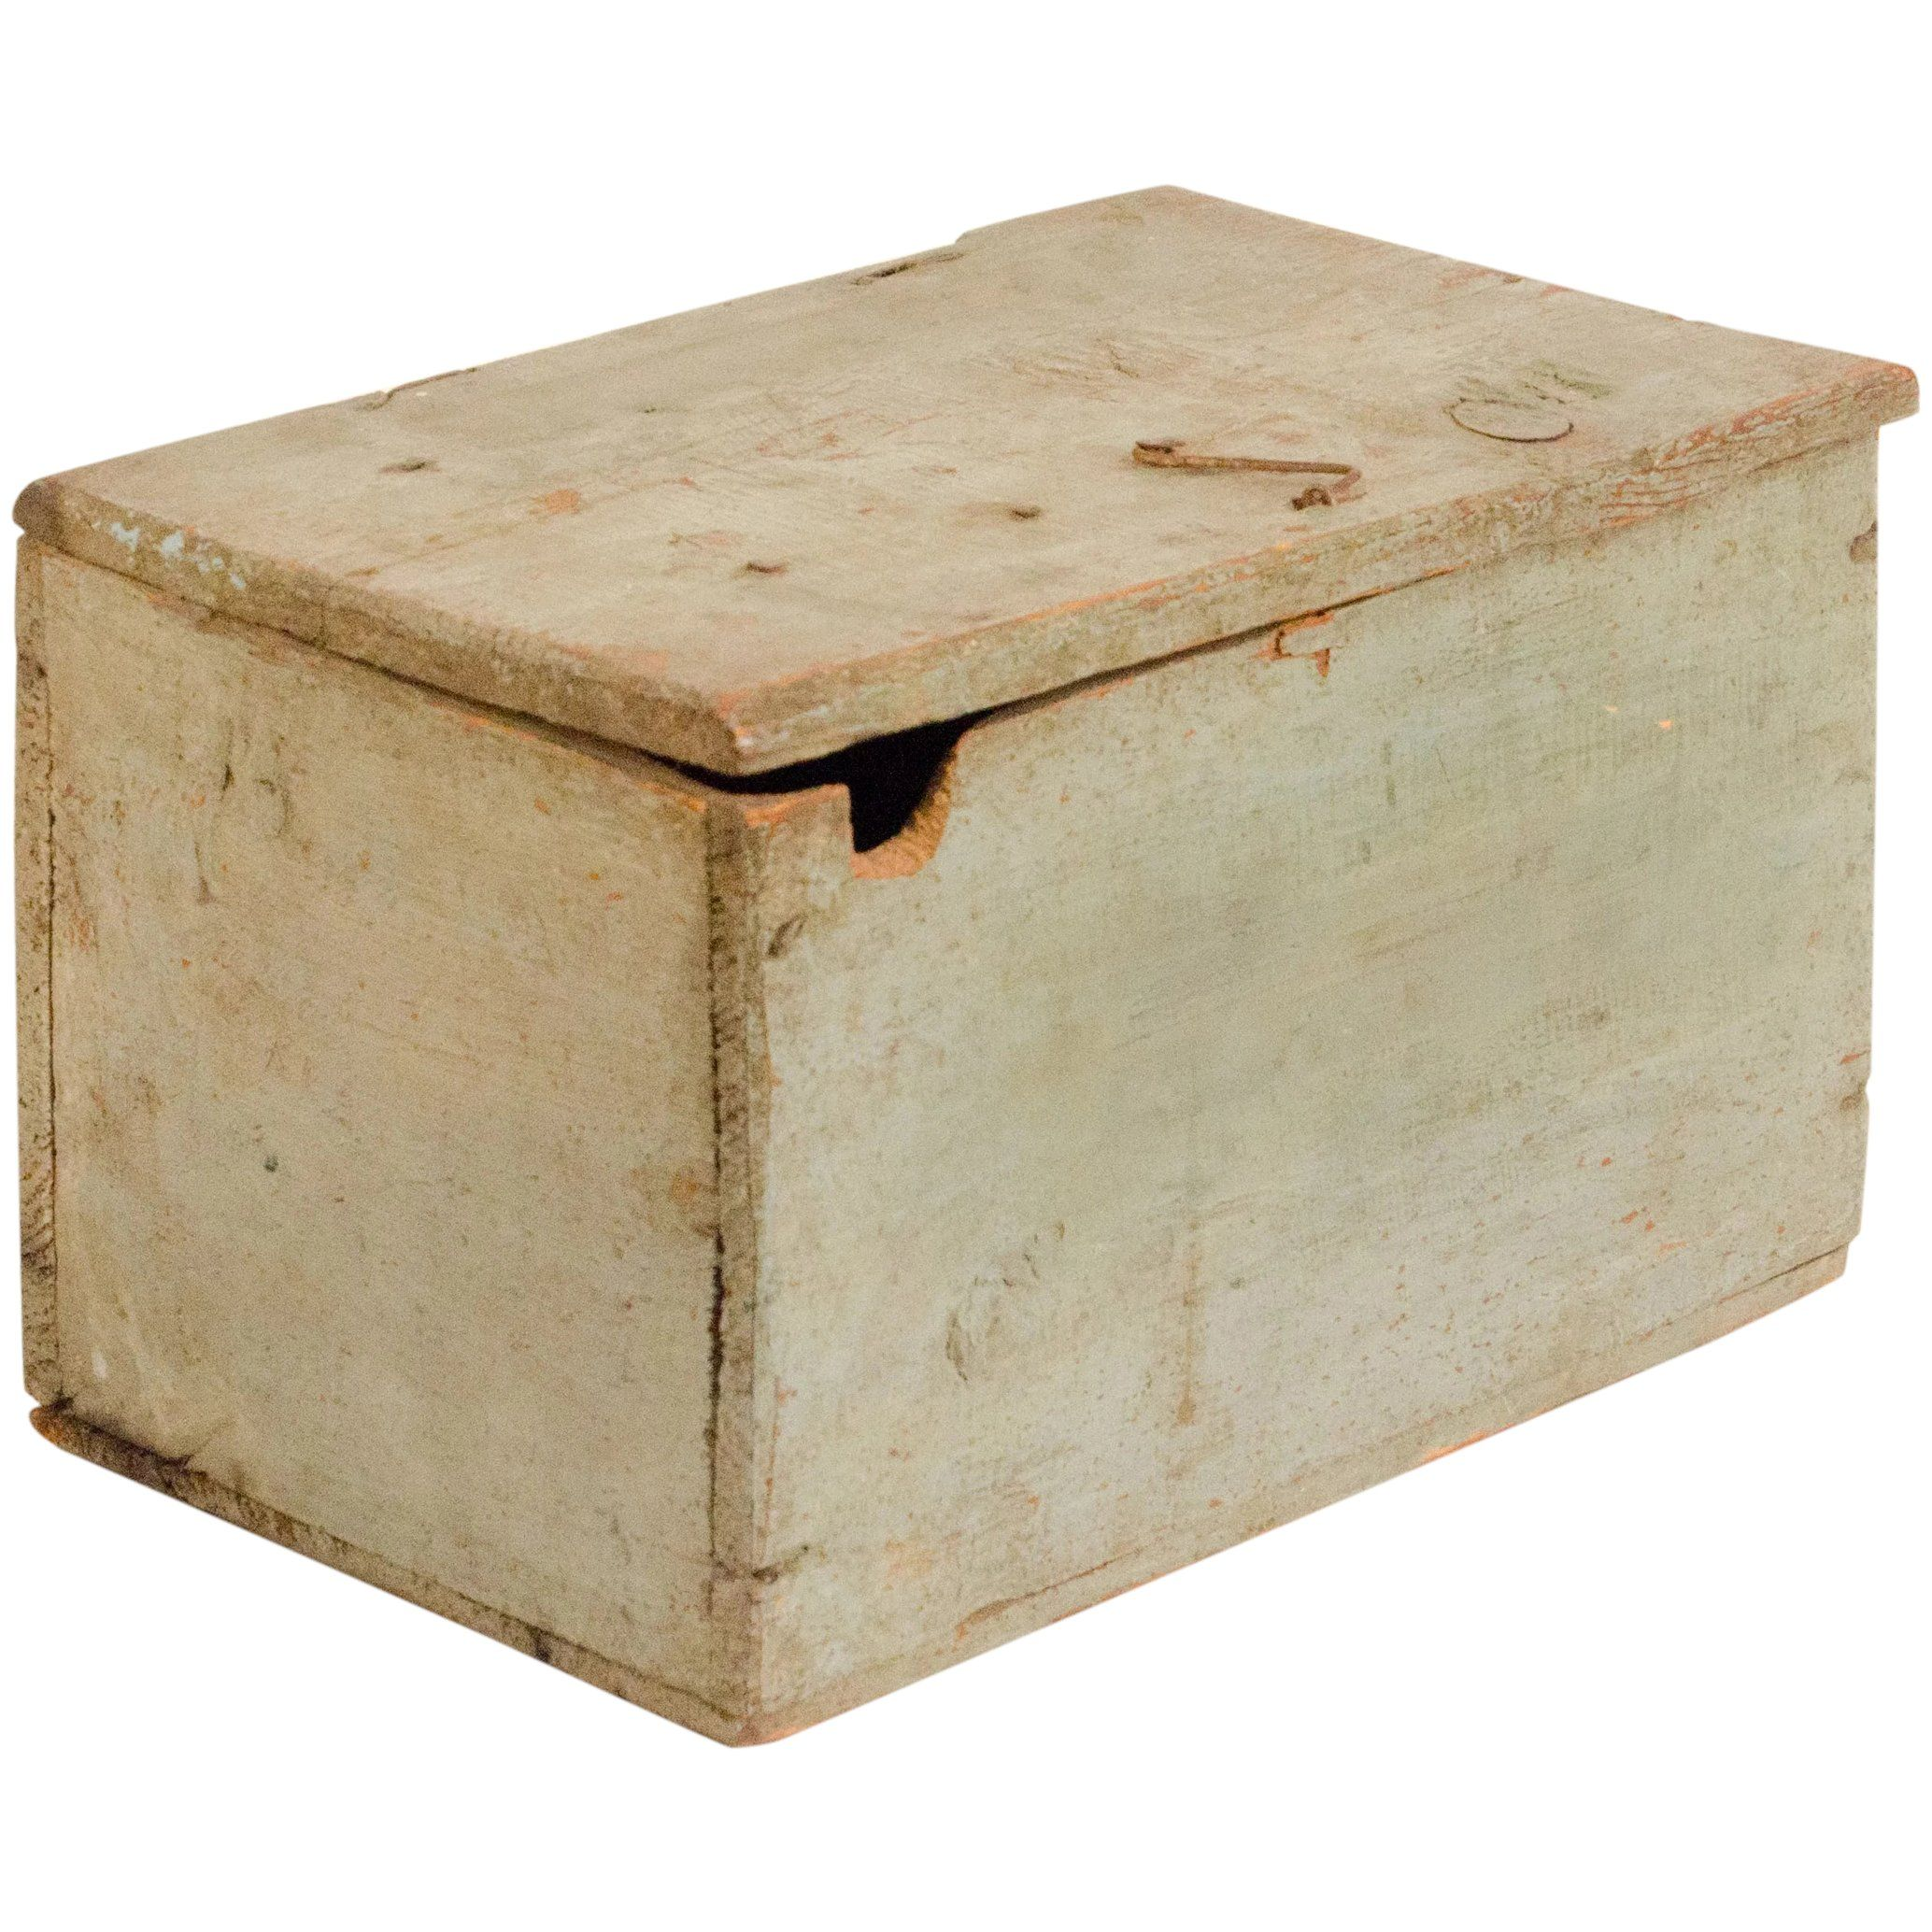 Vintage Swedish handmade Wooden Box with Lifter Handpainted Floral Box Primitive Wood Storage Rustic Kitchen Decor Scandinavian Jar